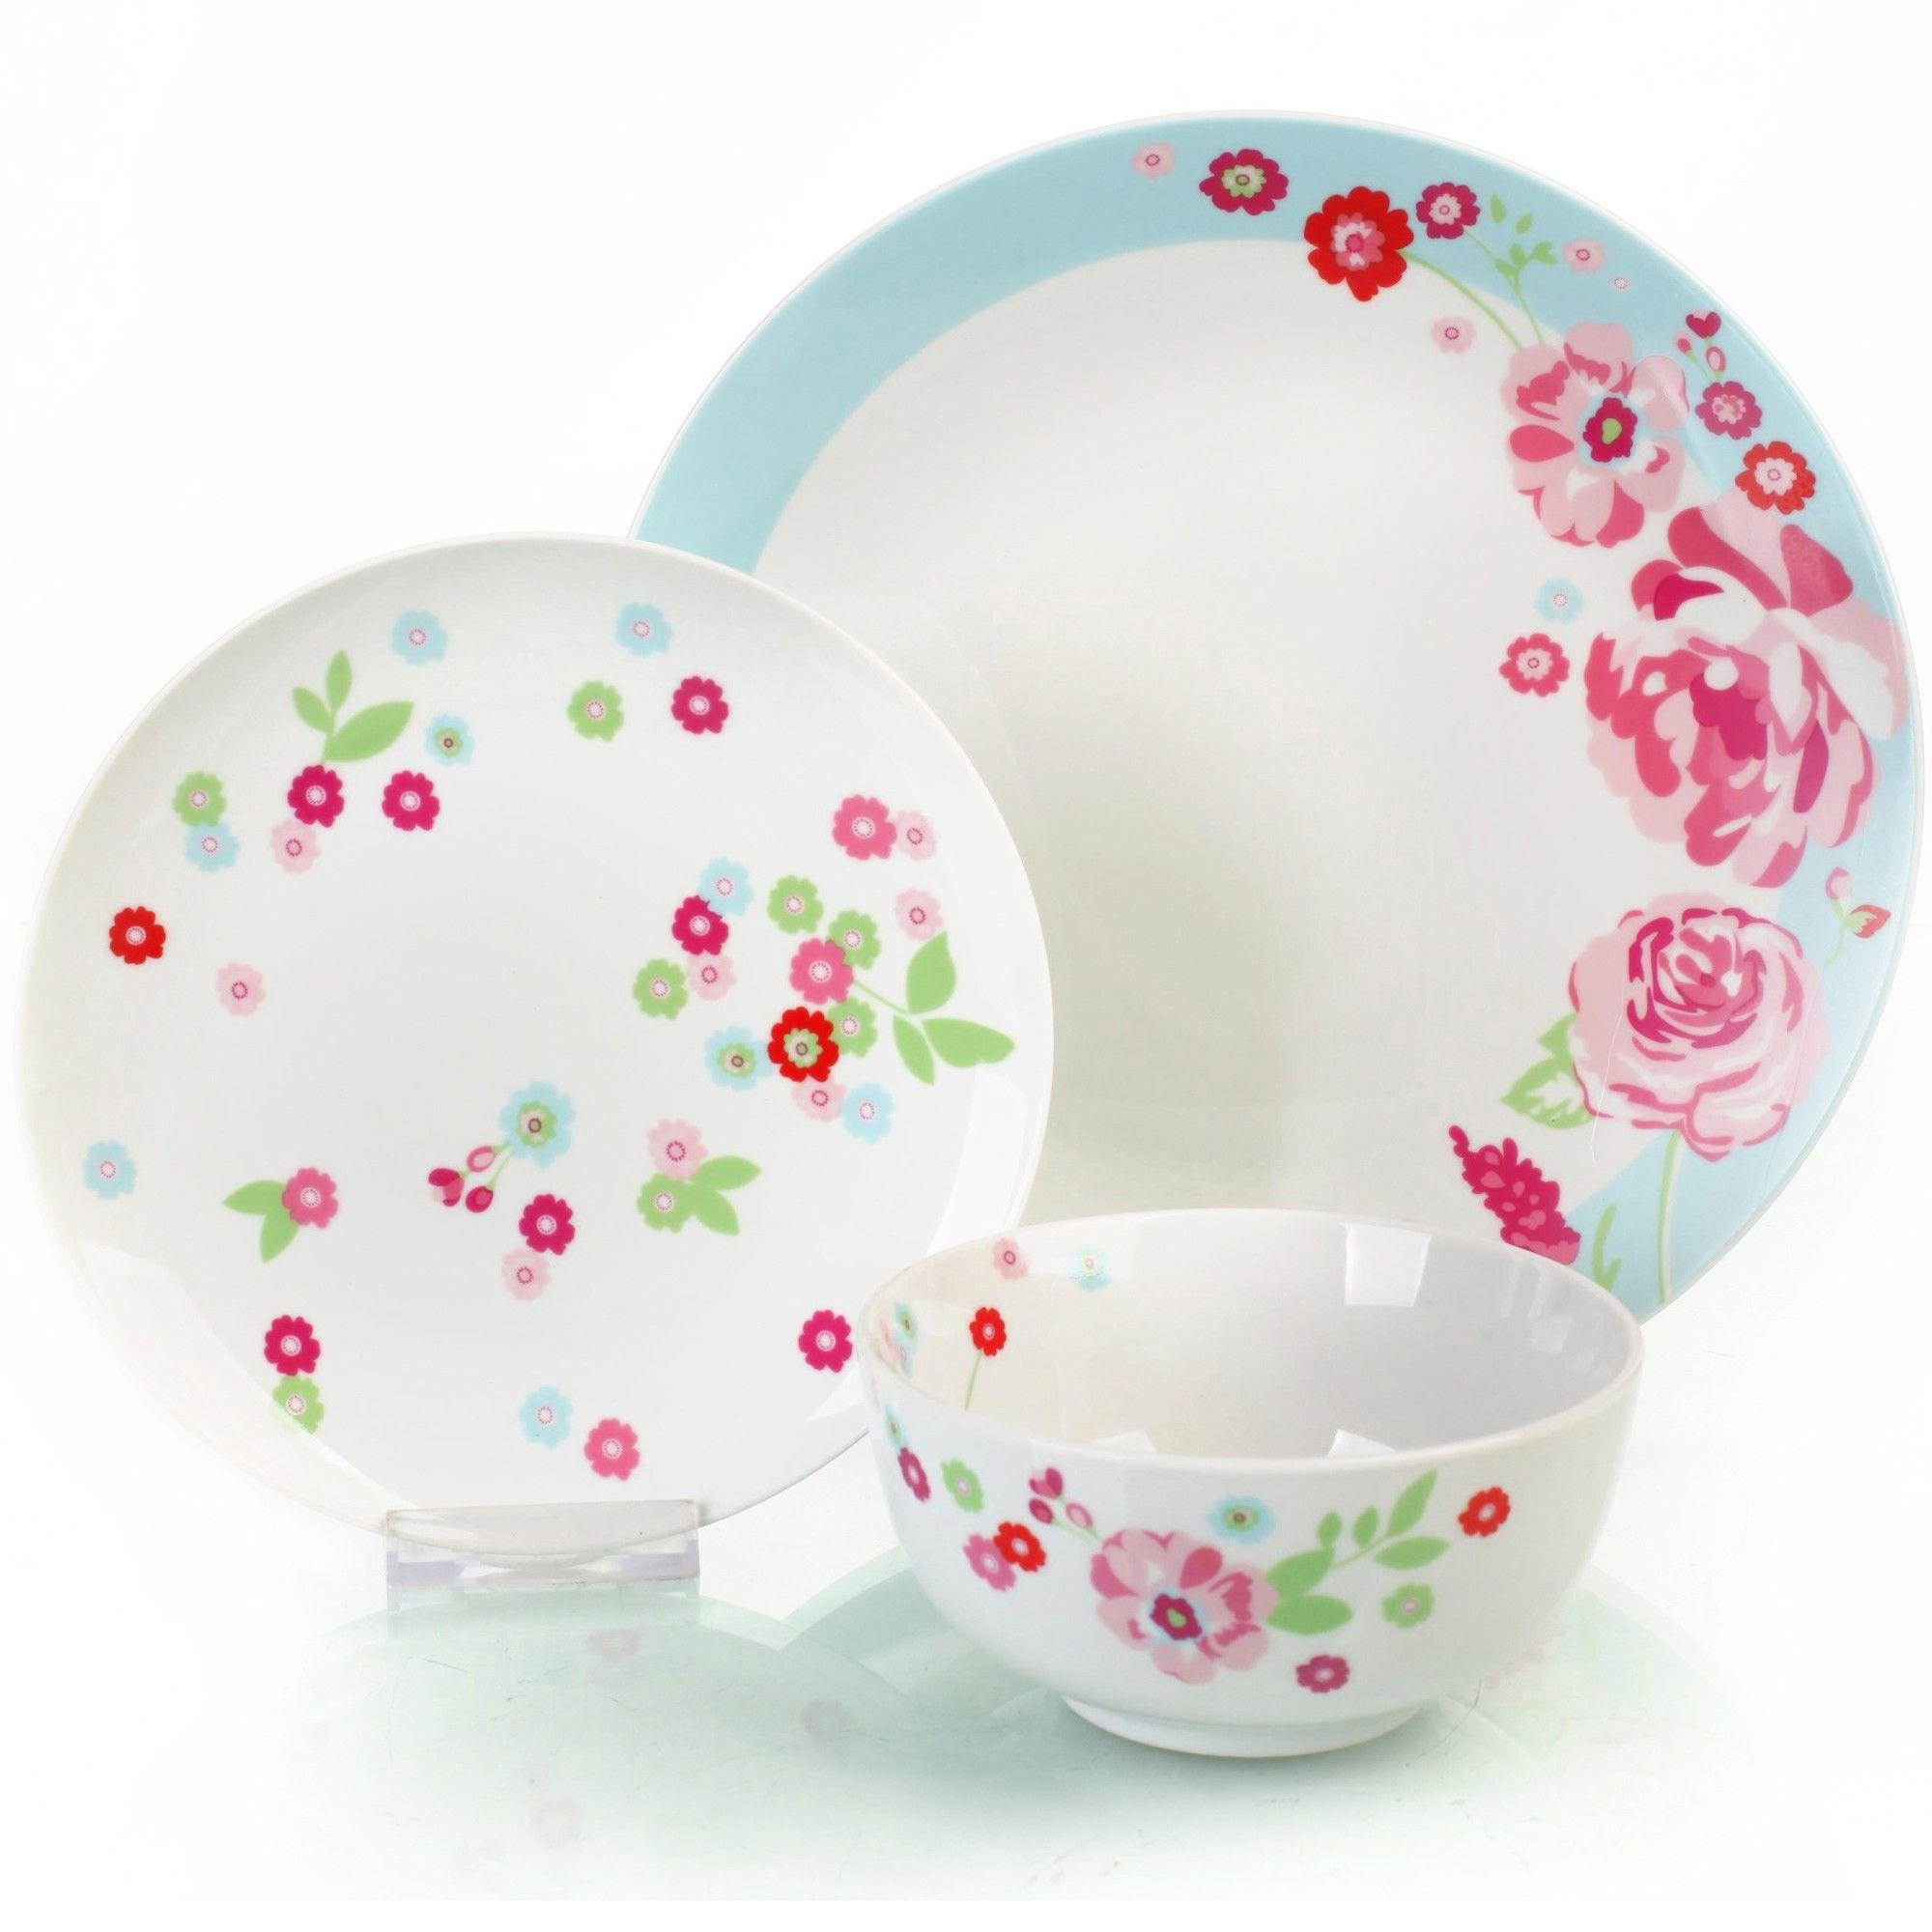 Buy Sabichi Dahlia Porcelain 12 Piece Dinner Set From Our Dinner Sets Range  At Tesco Direct.